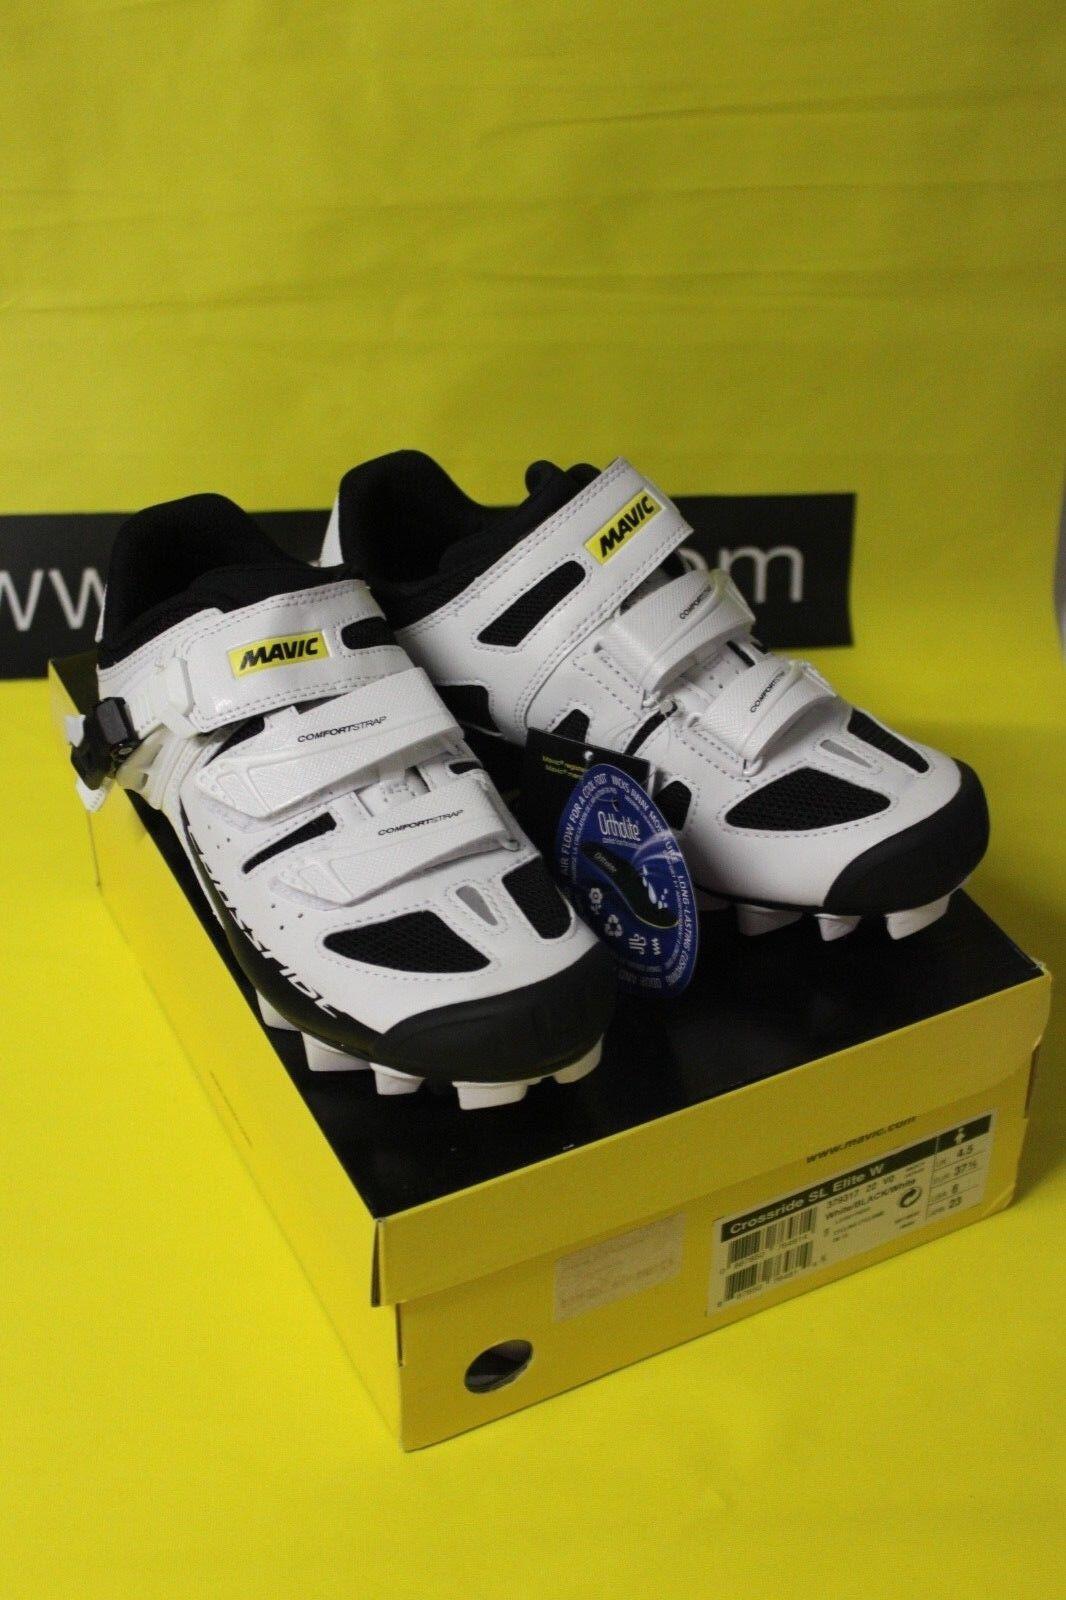 MAVIC Damen MTB-Schuhe Crossride SL Elite, Größe UK 4, EUR 36 2/3